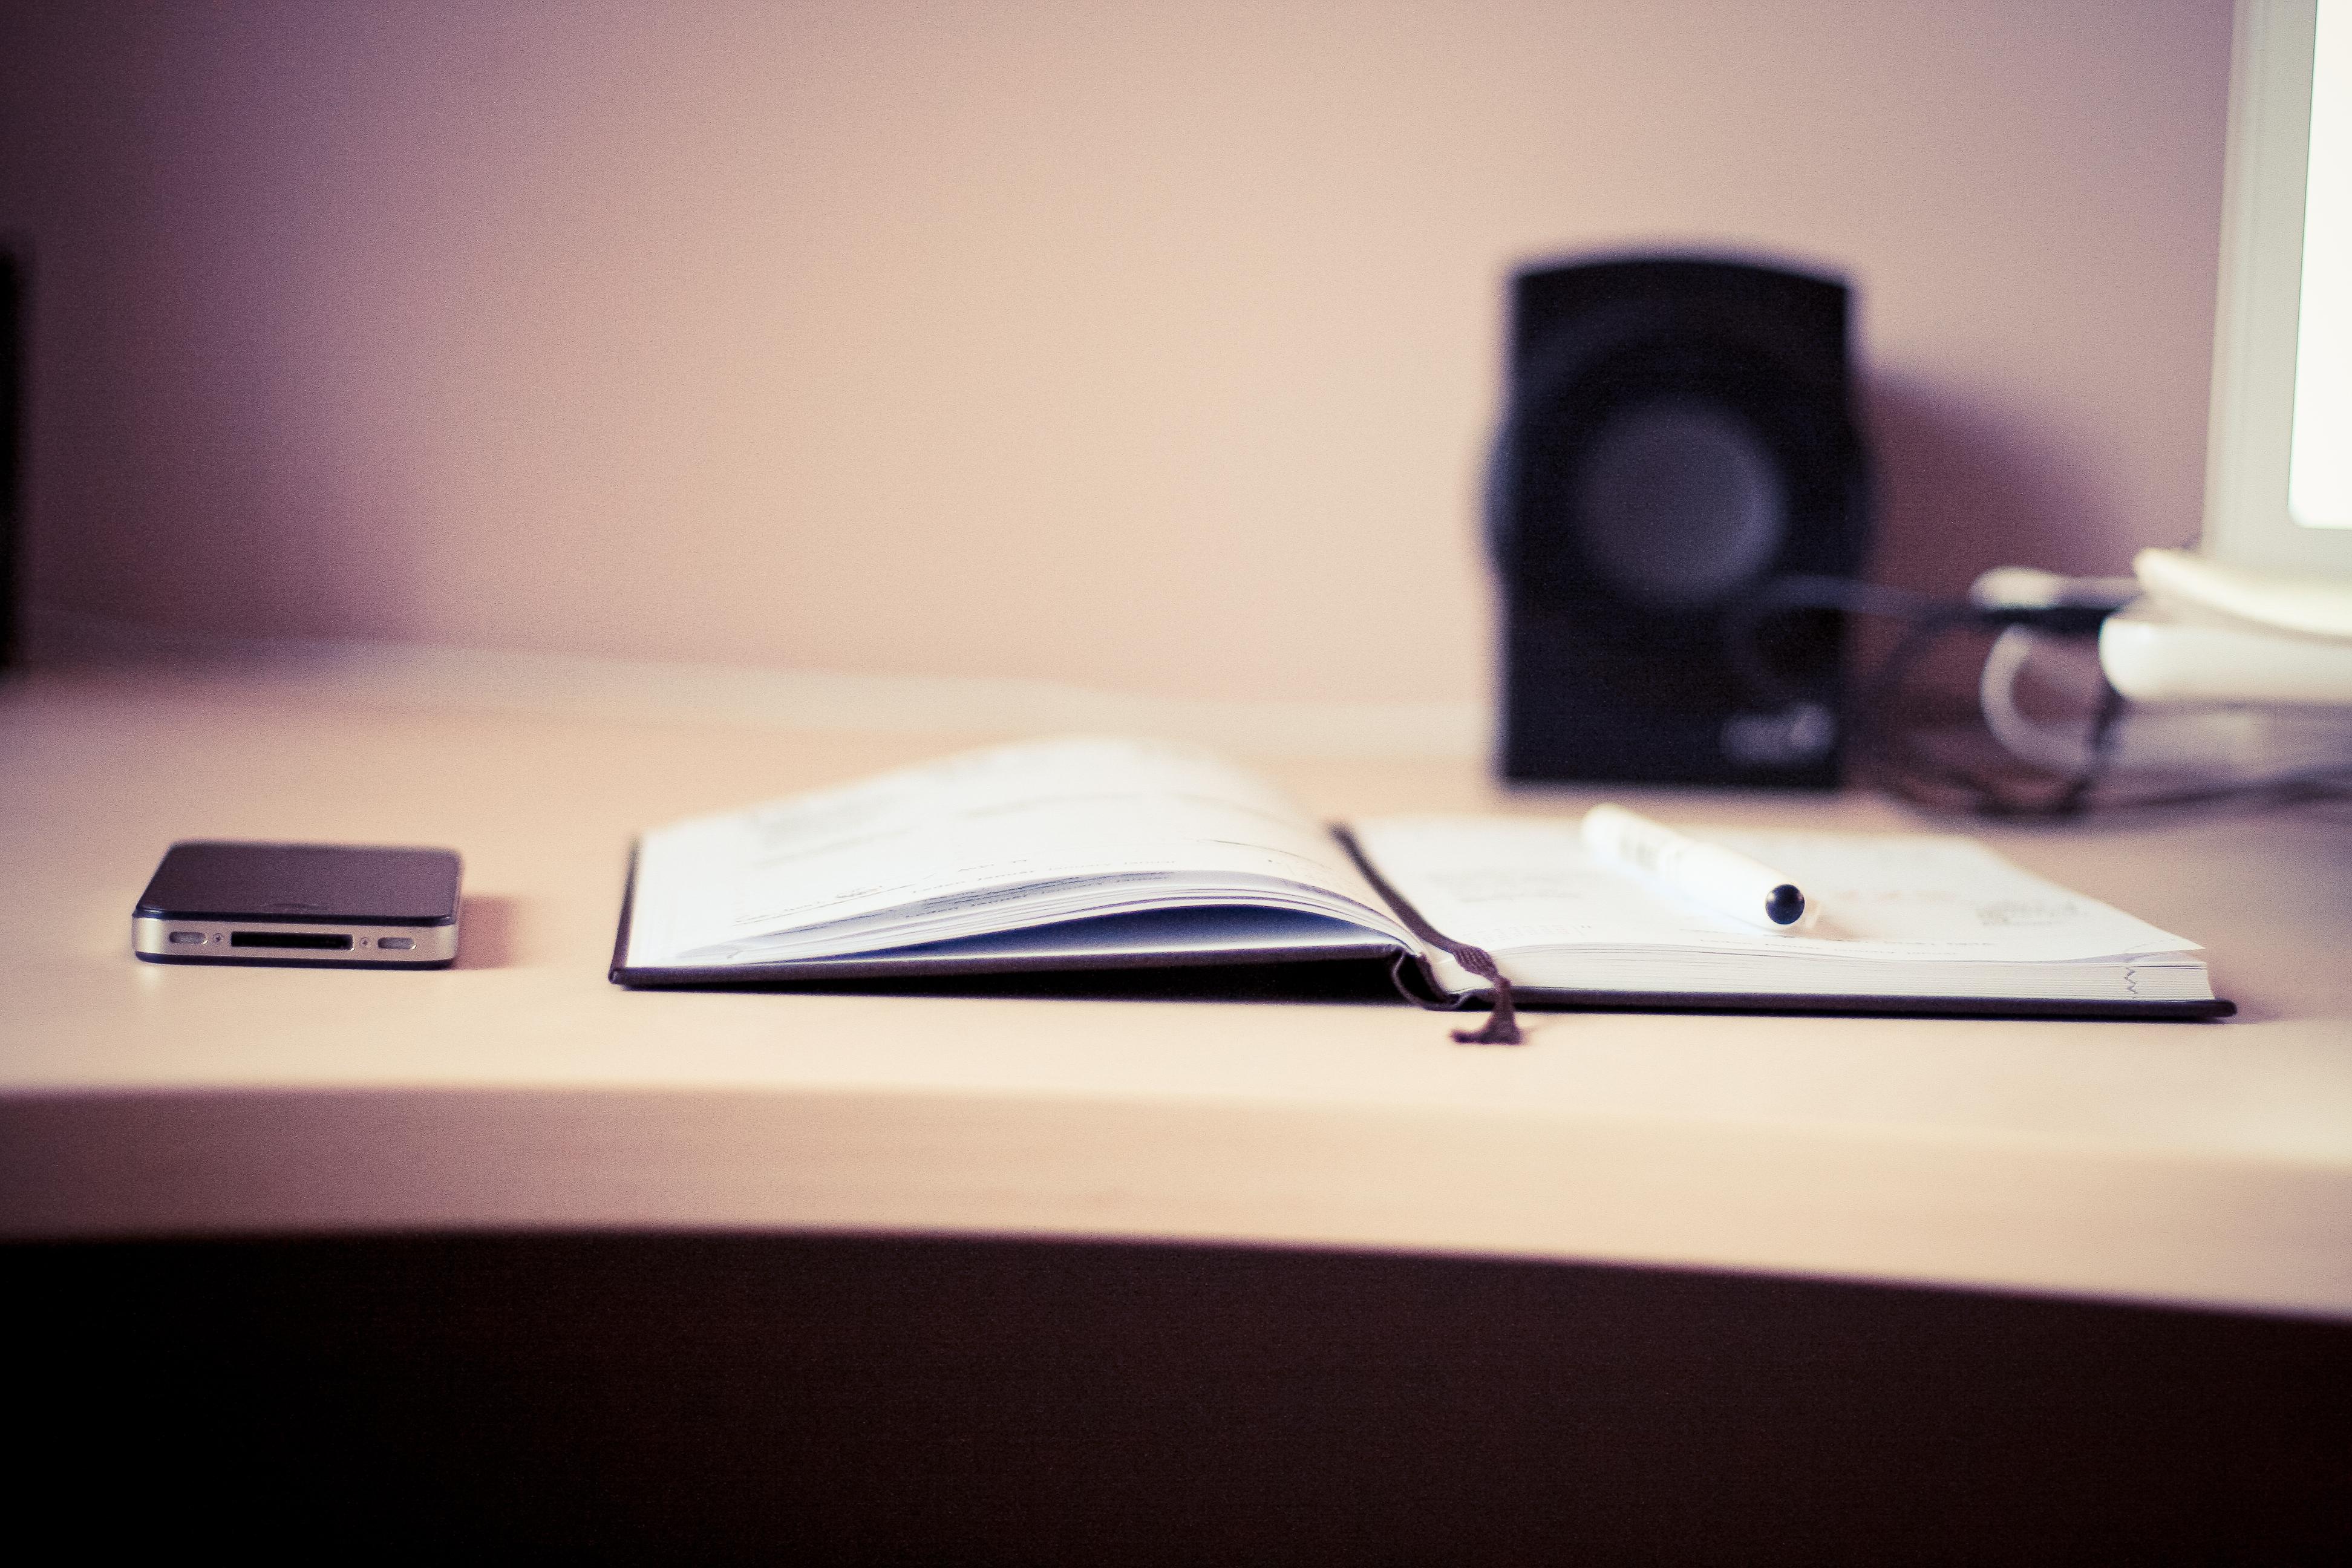 the-diary-with-black-iphone-picjumbo-com (1)